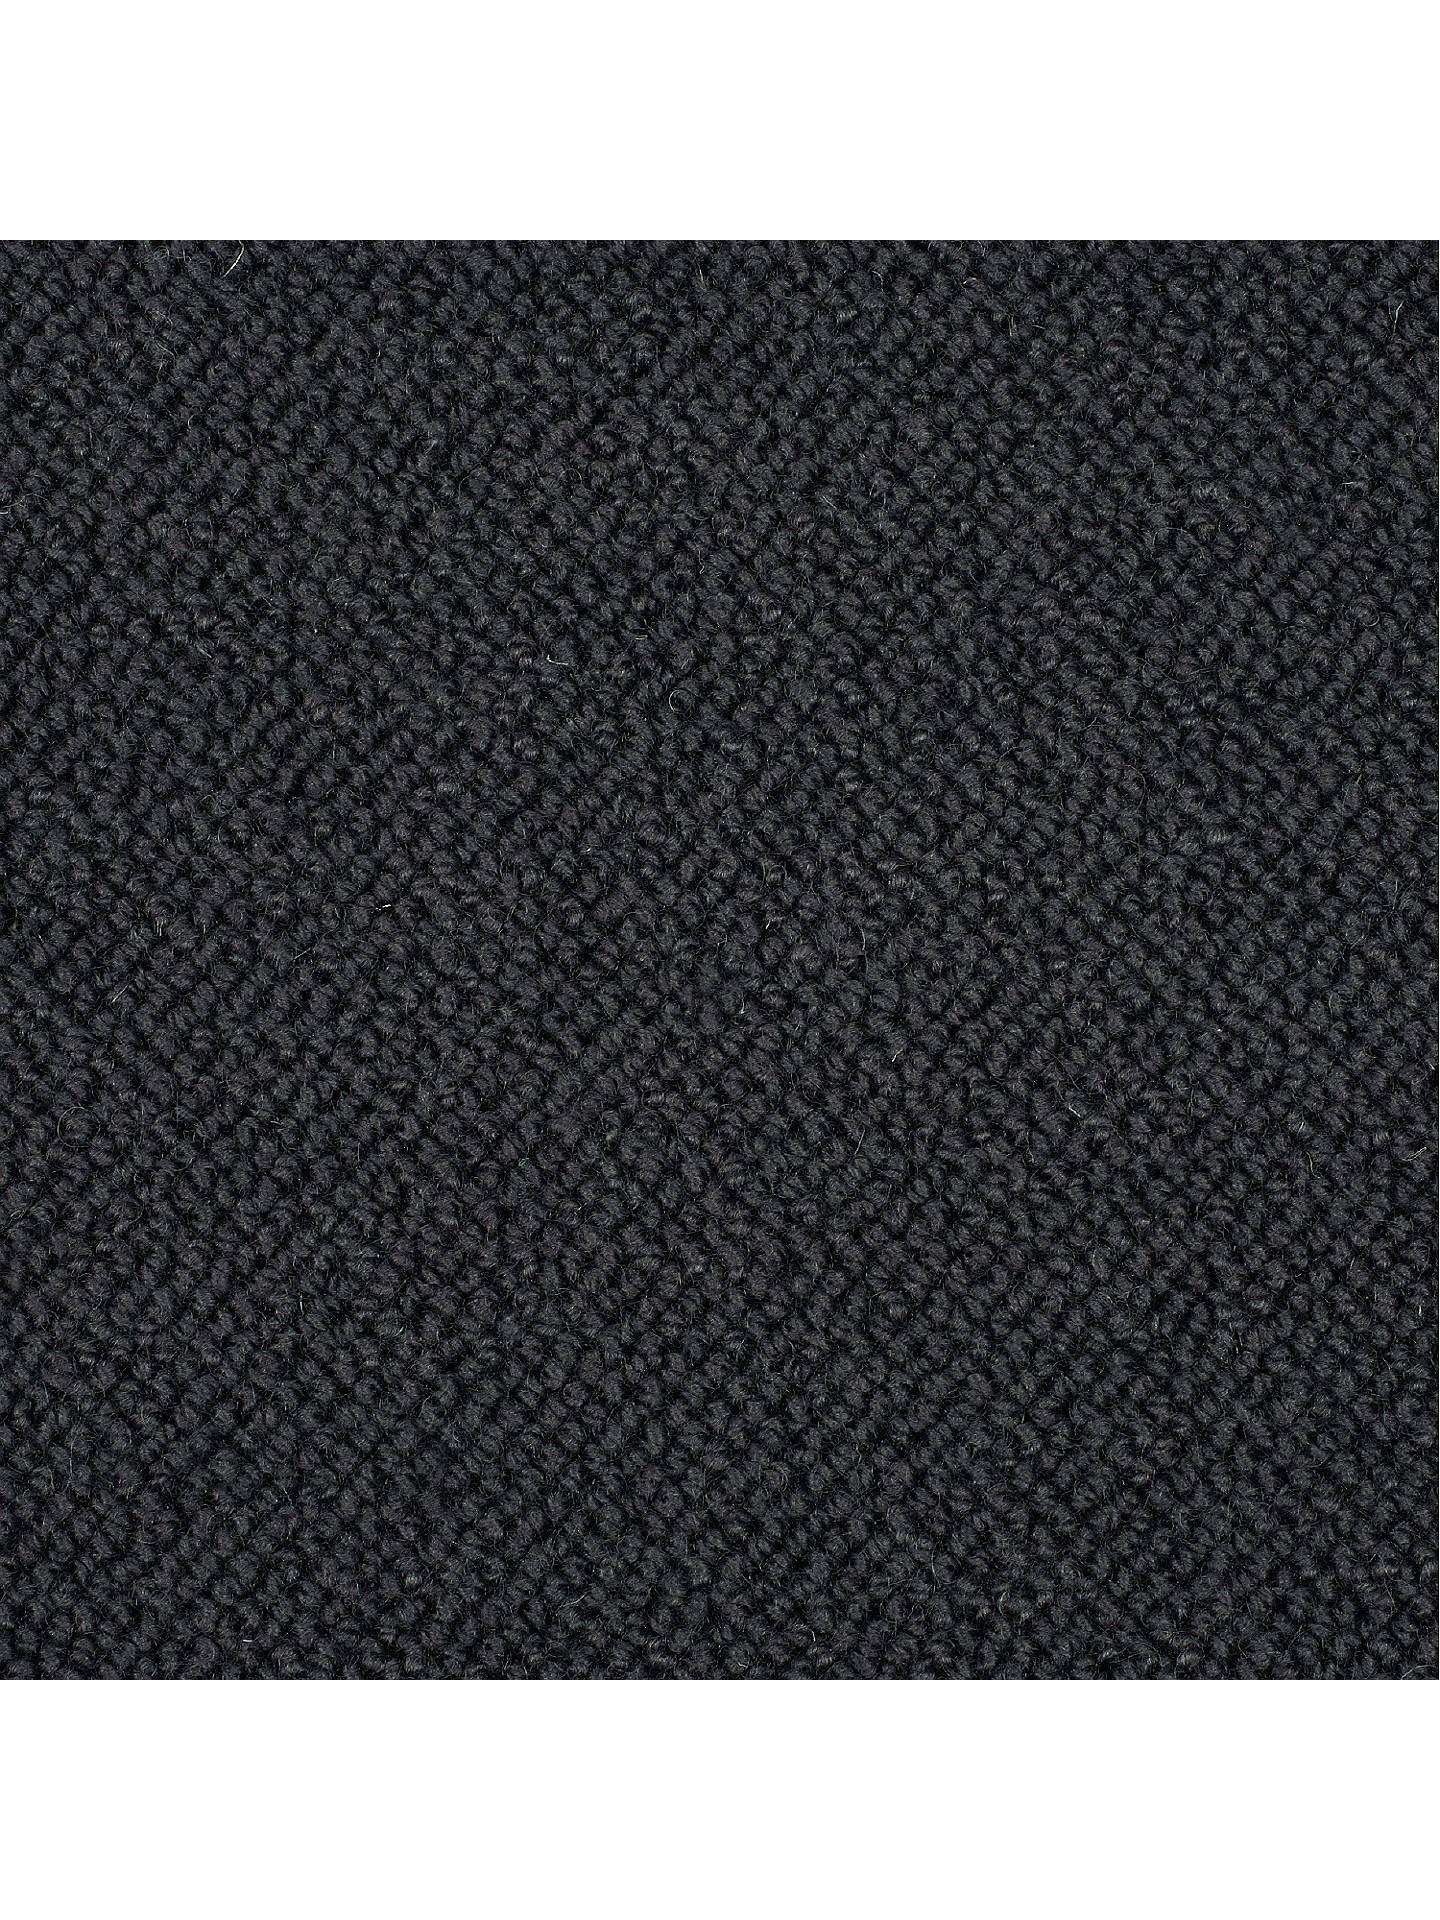 john lewis partners berber wool loop carpet at john. Black Bedroom Furniture Sets. Home Design Ideas